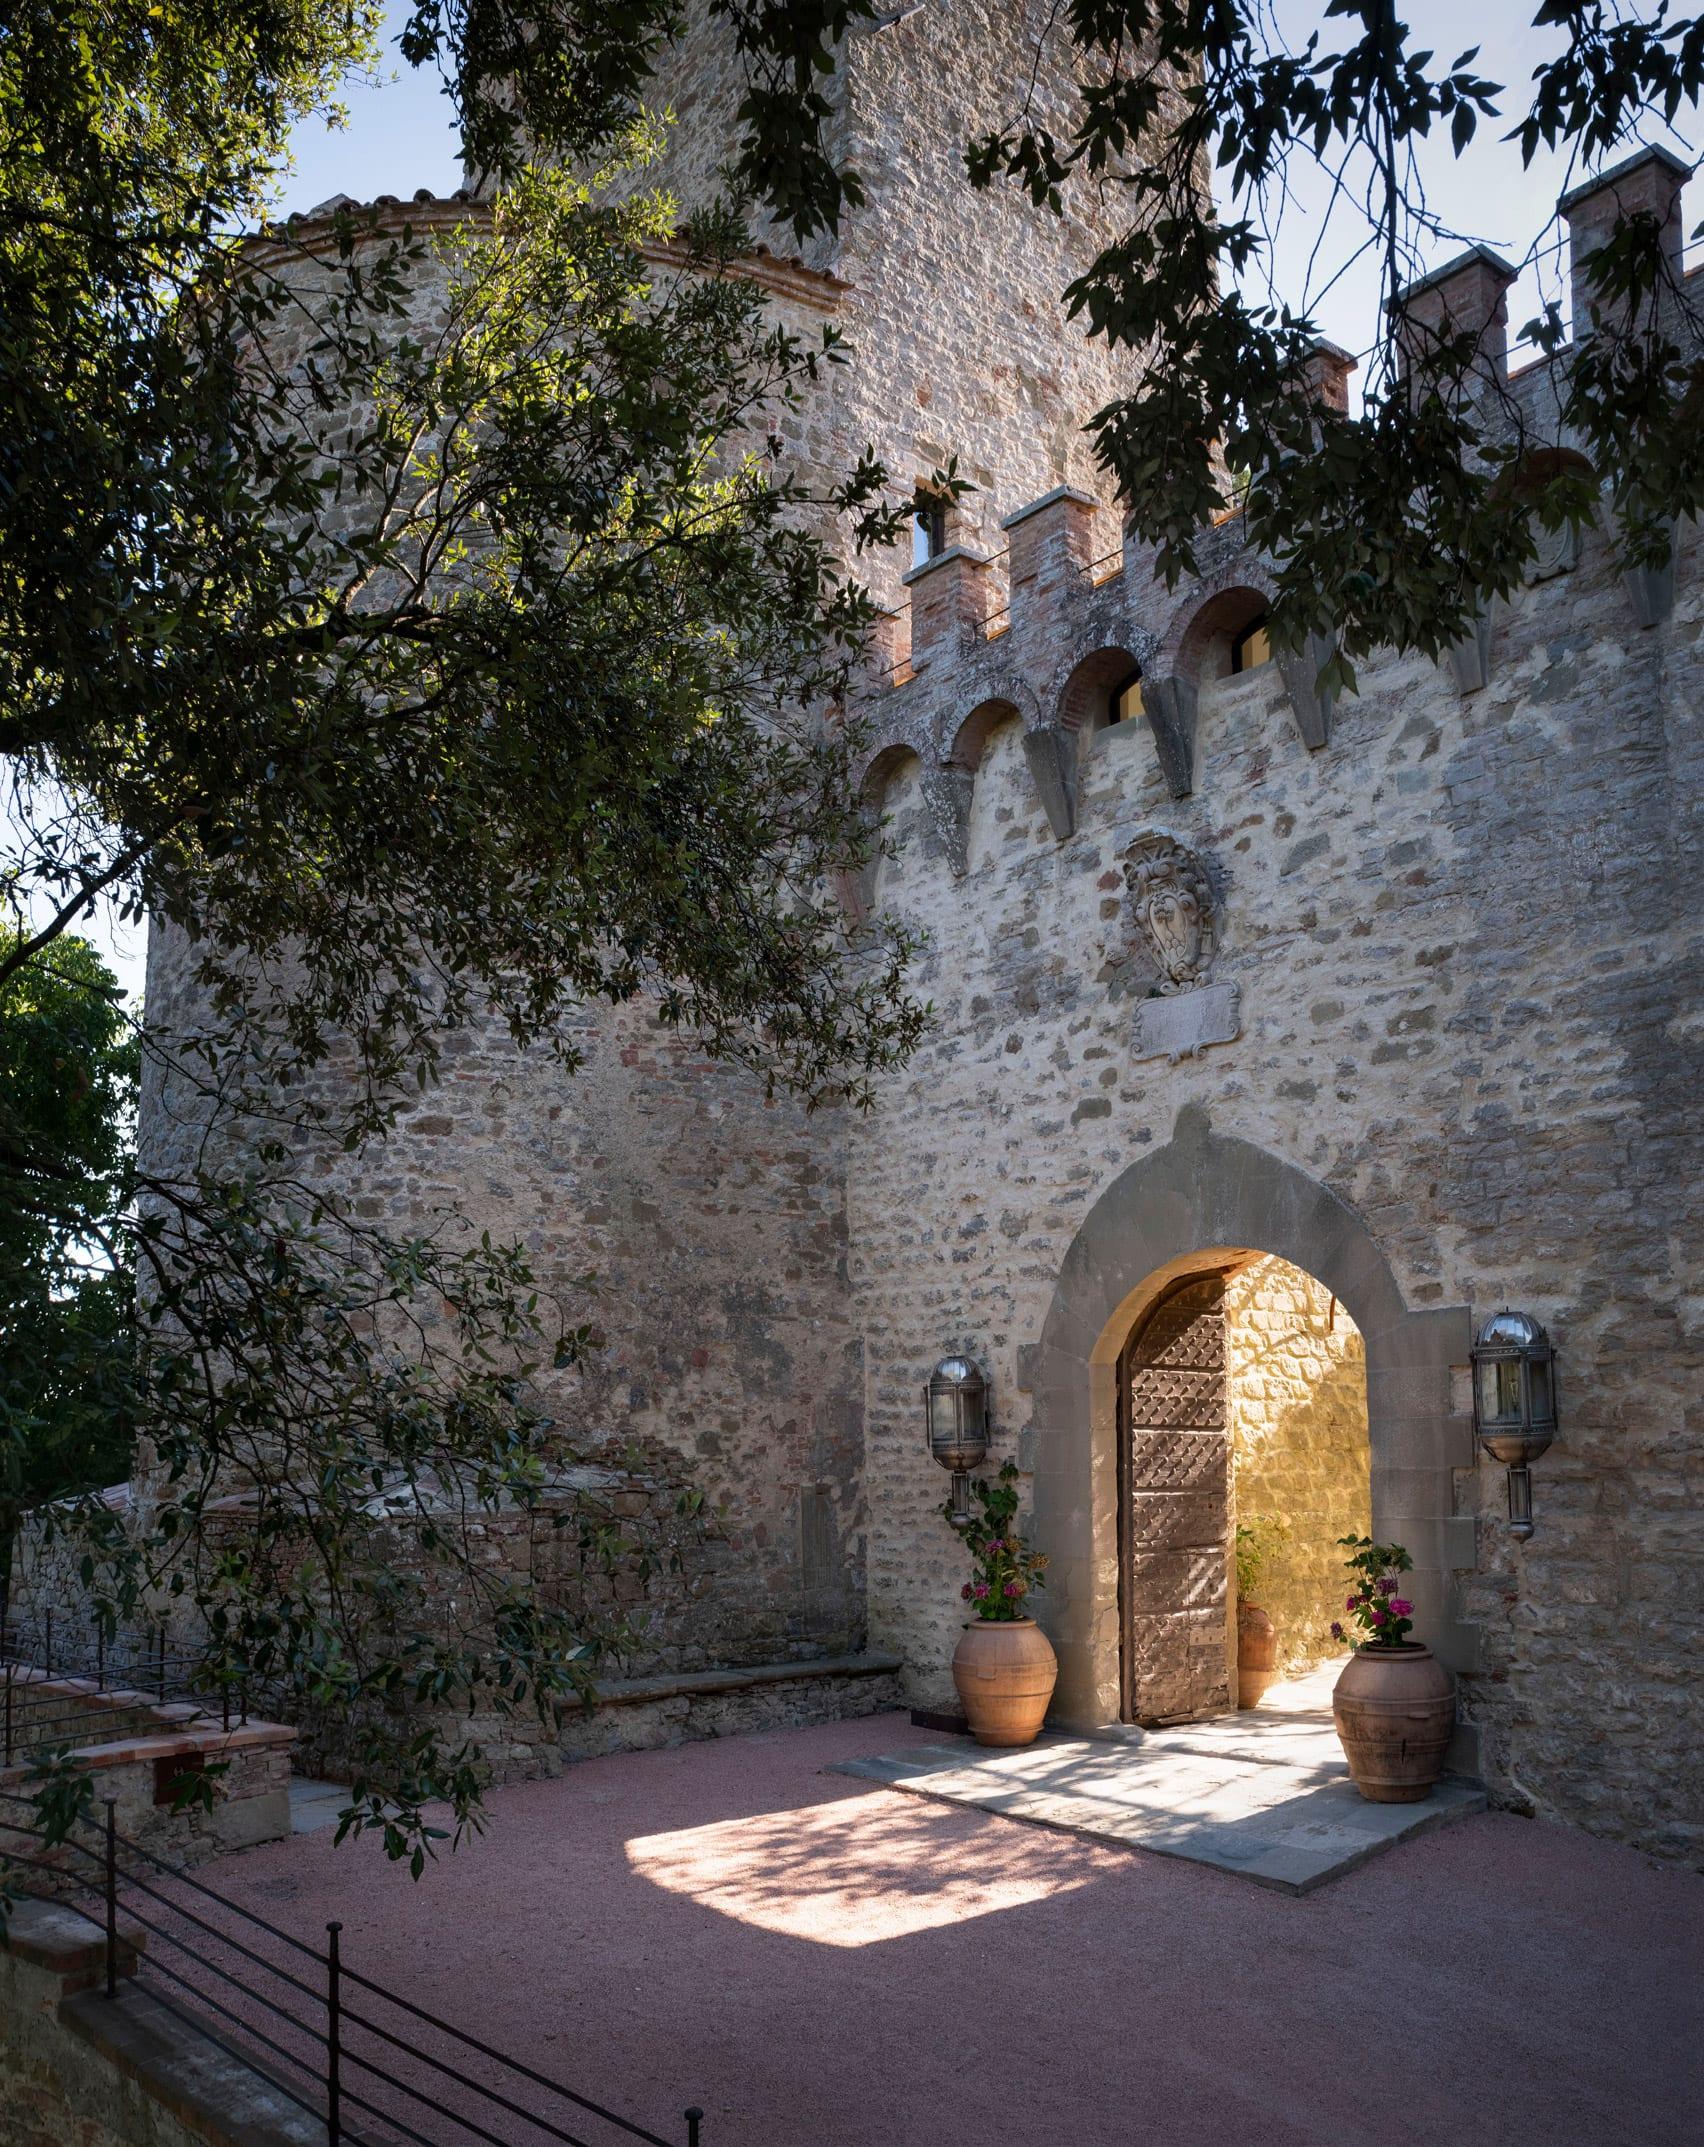 Hotel Castello di Reschio in Umbria